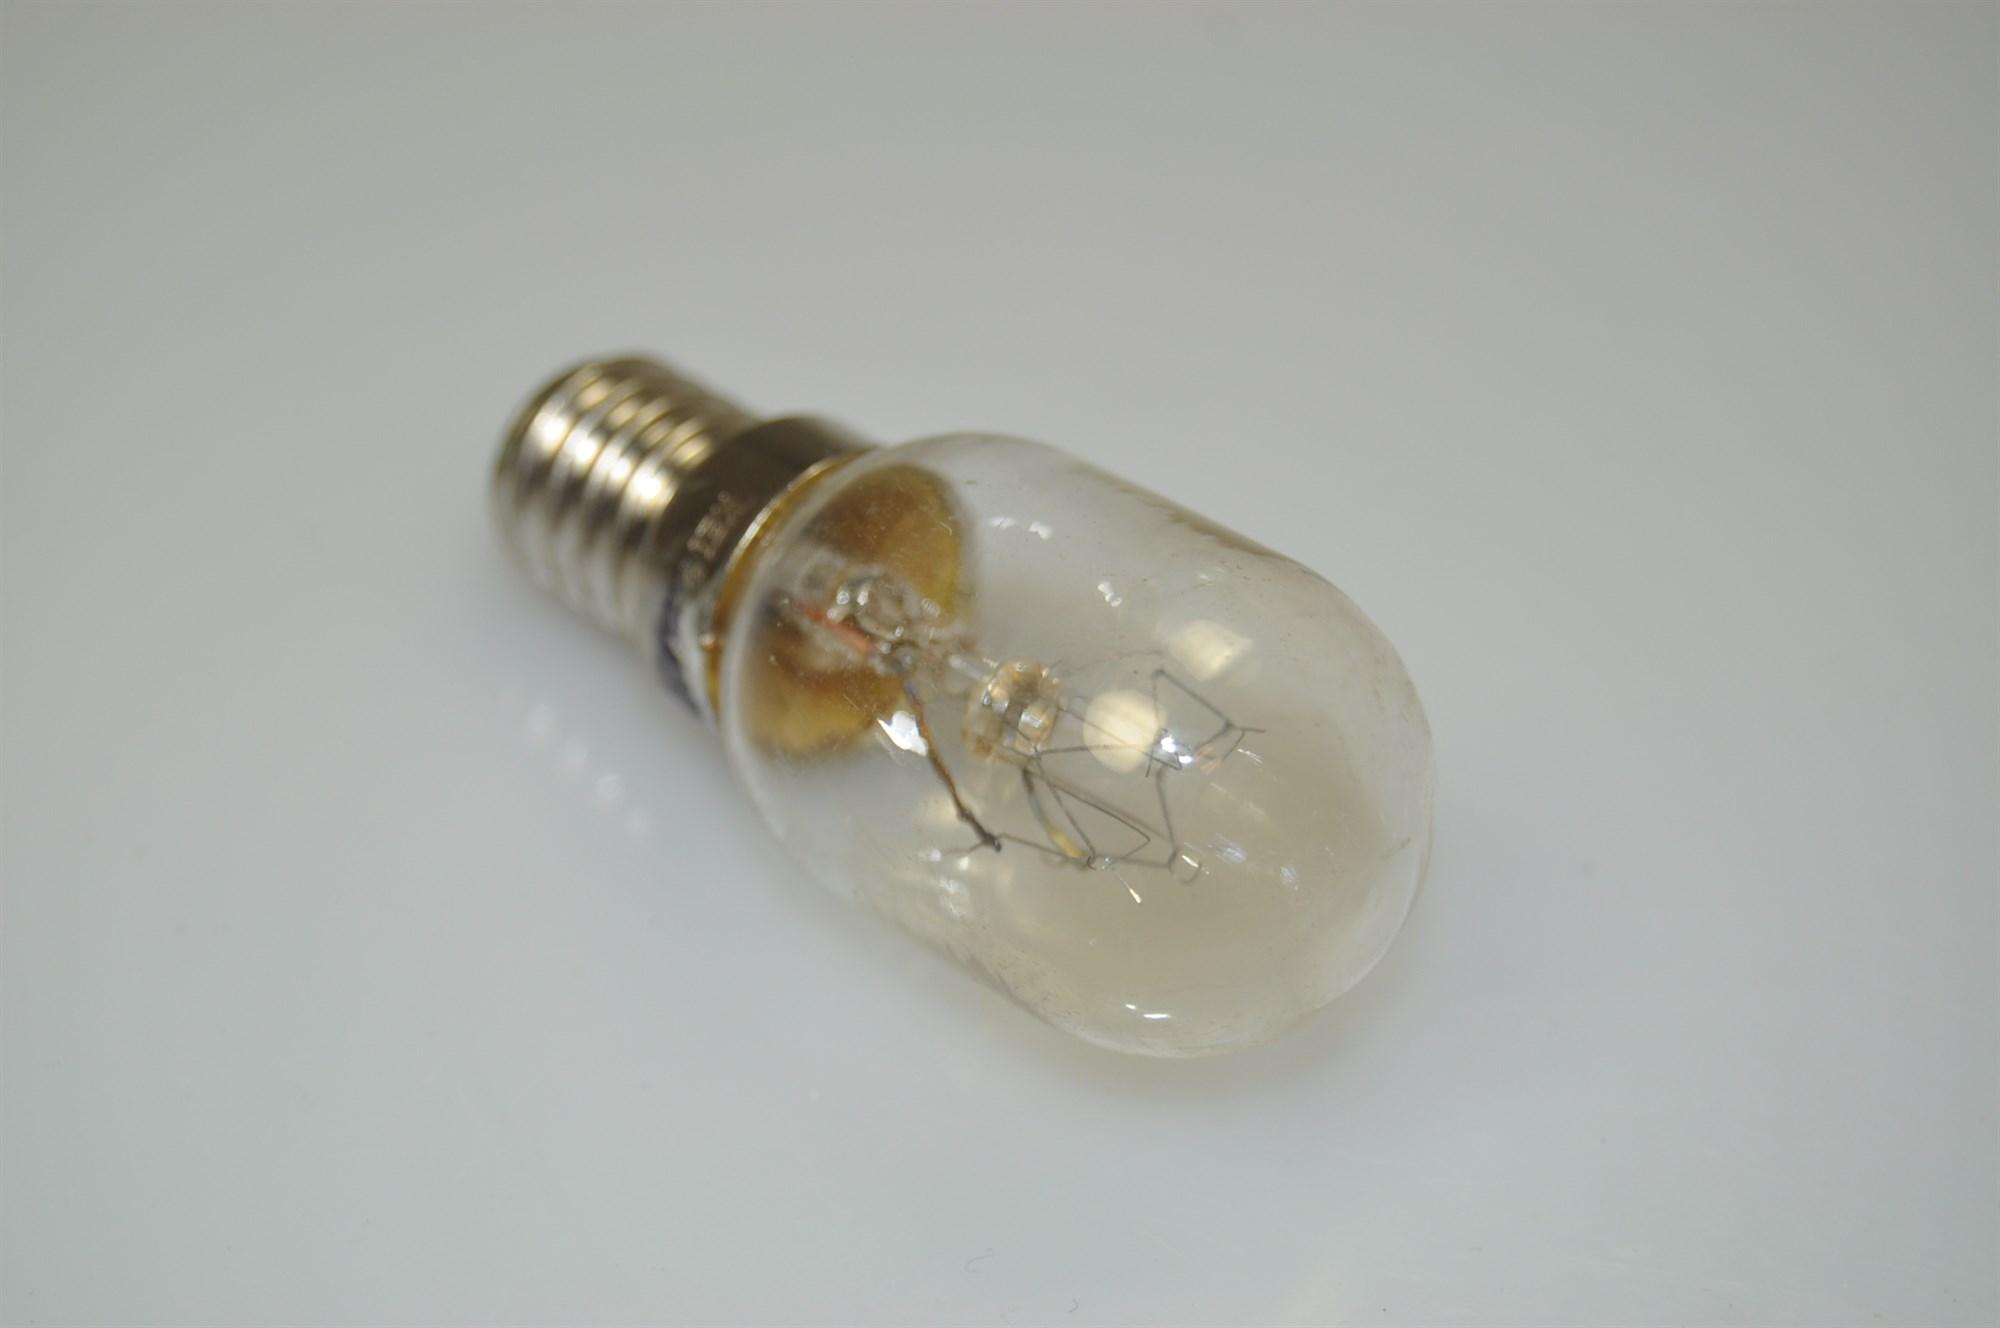 Kühlschrank Glühbirne : Glühbirne lg electronics side by side kühlschrank wasserspender